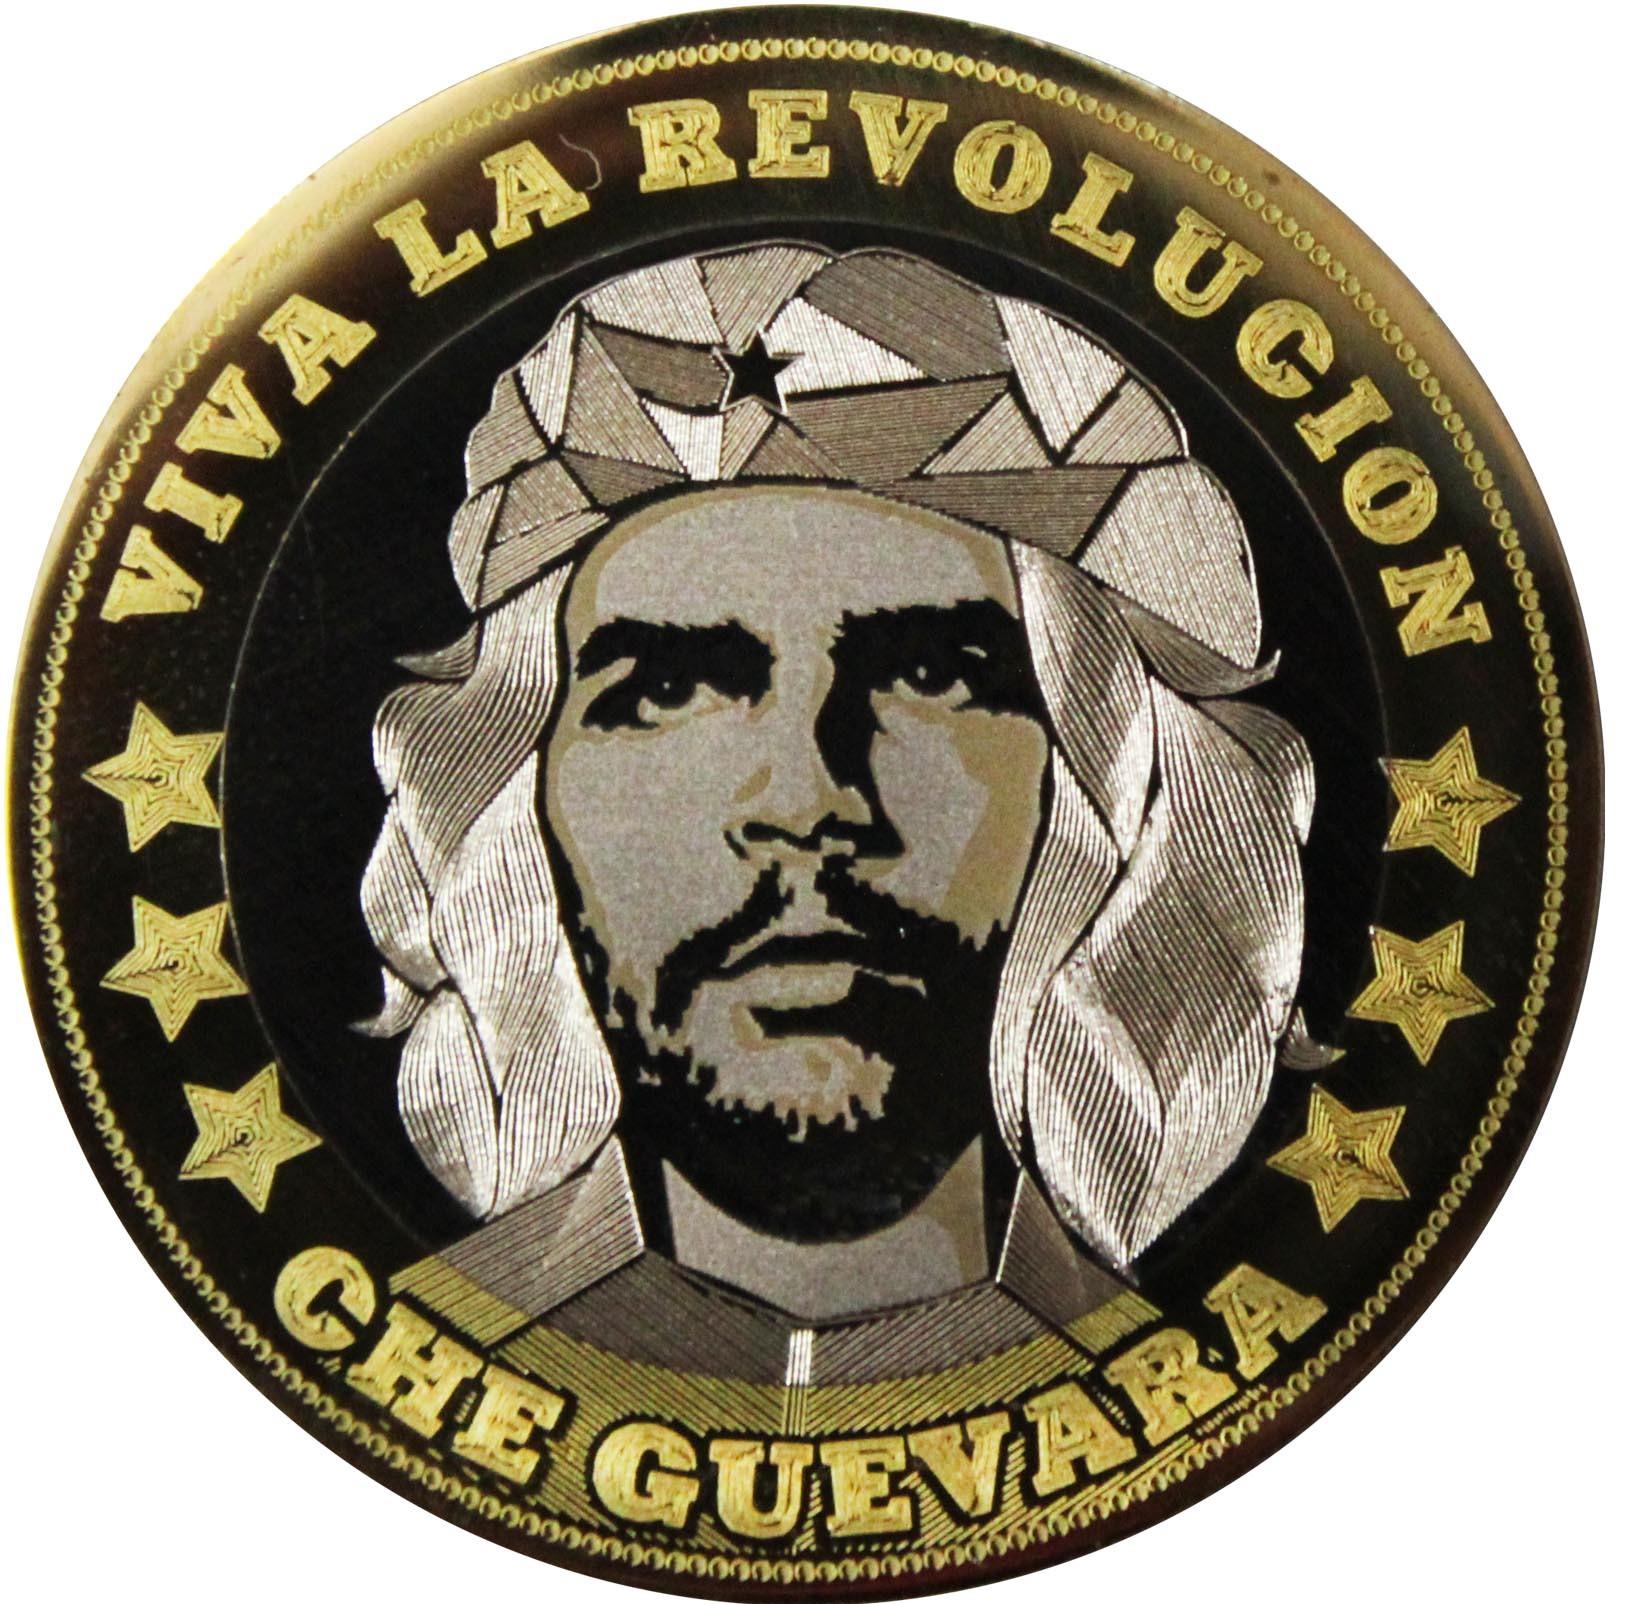 Че Гевара. Гравированная монета 10 рублей